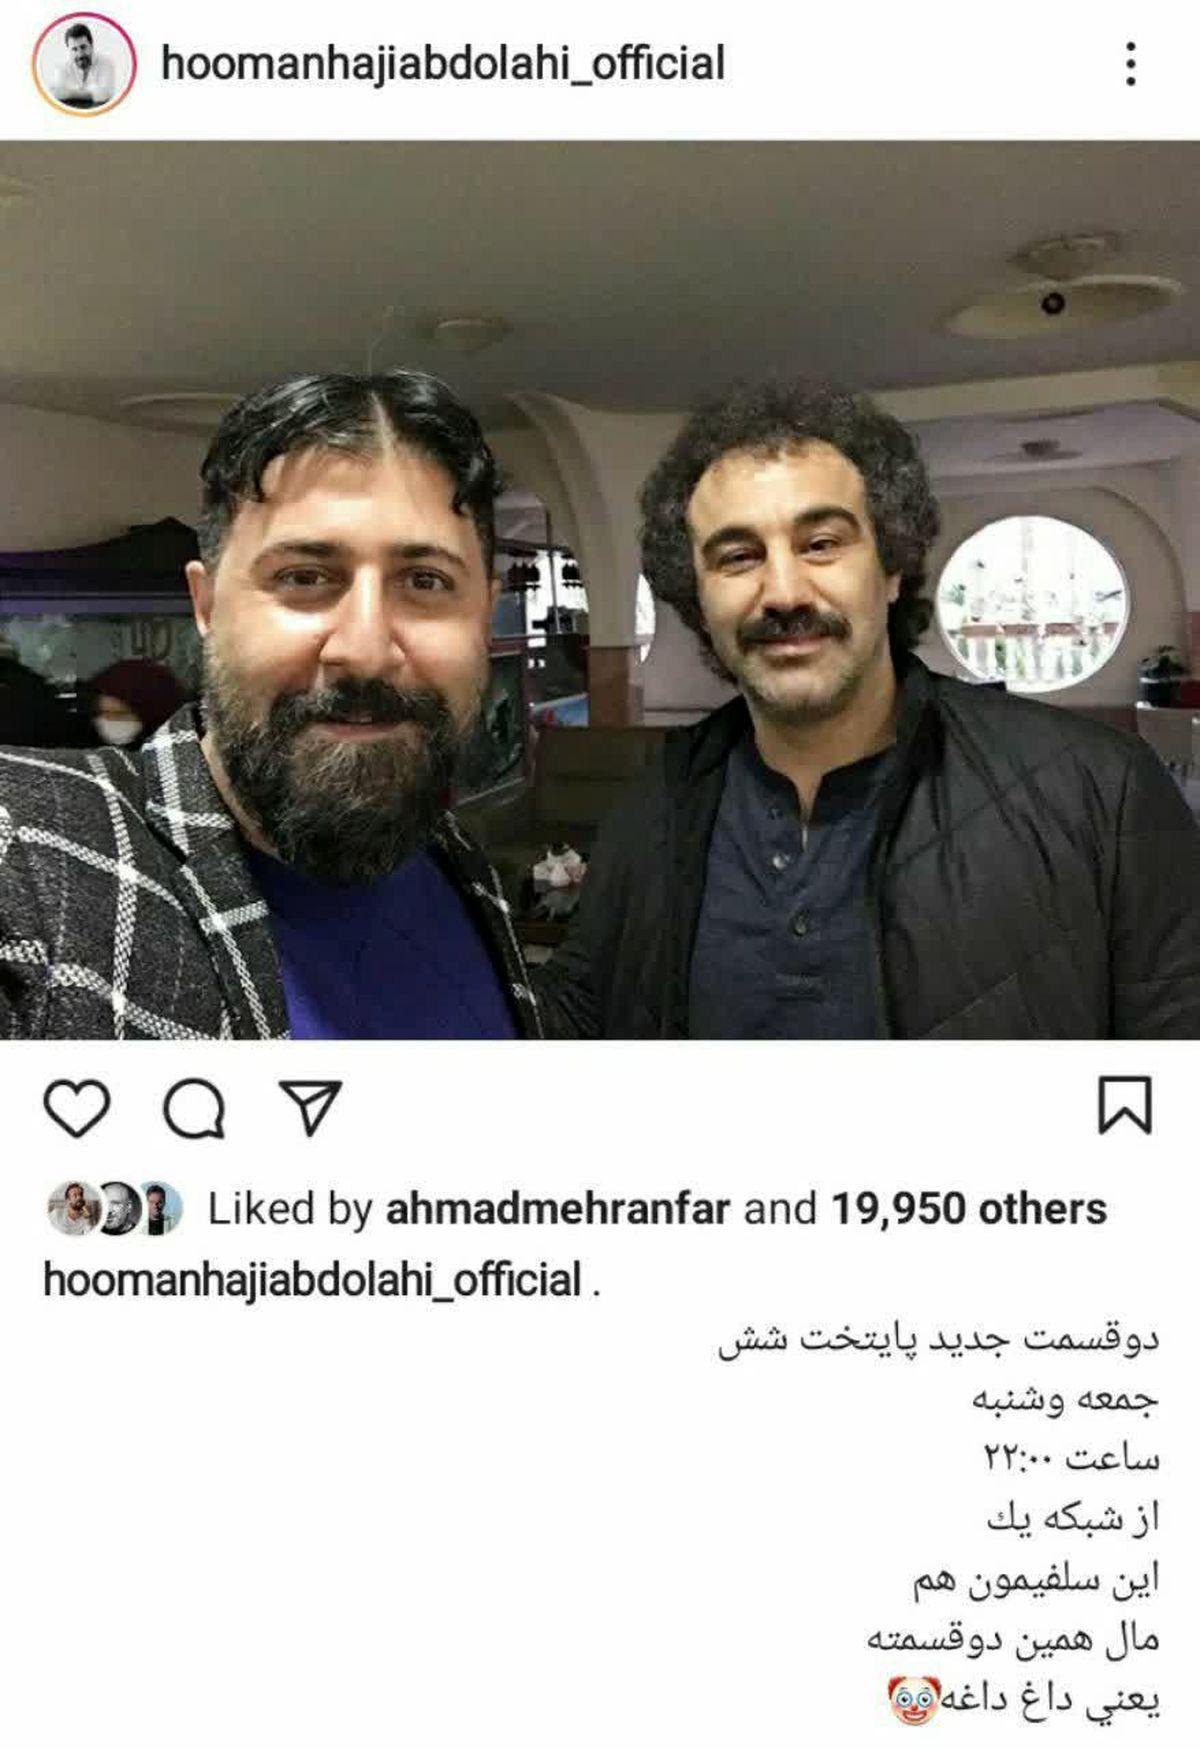 سلفی نقی و رحمت در رستوران لاکچری +عکس